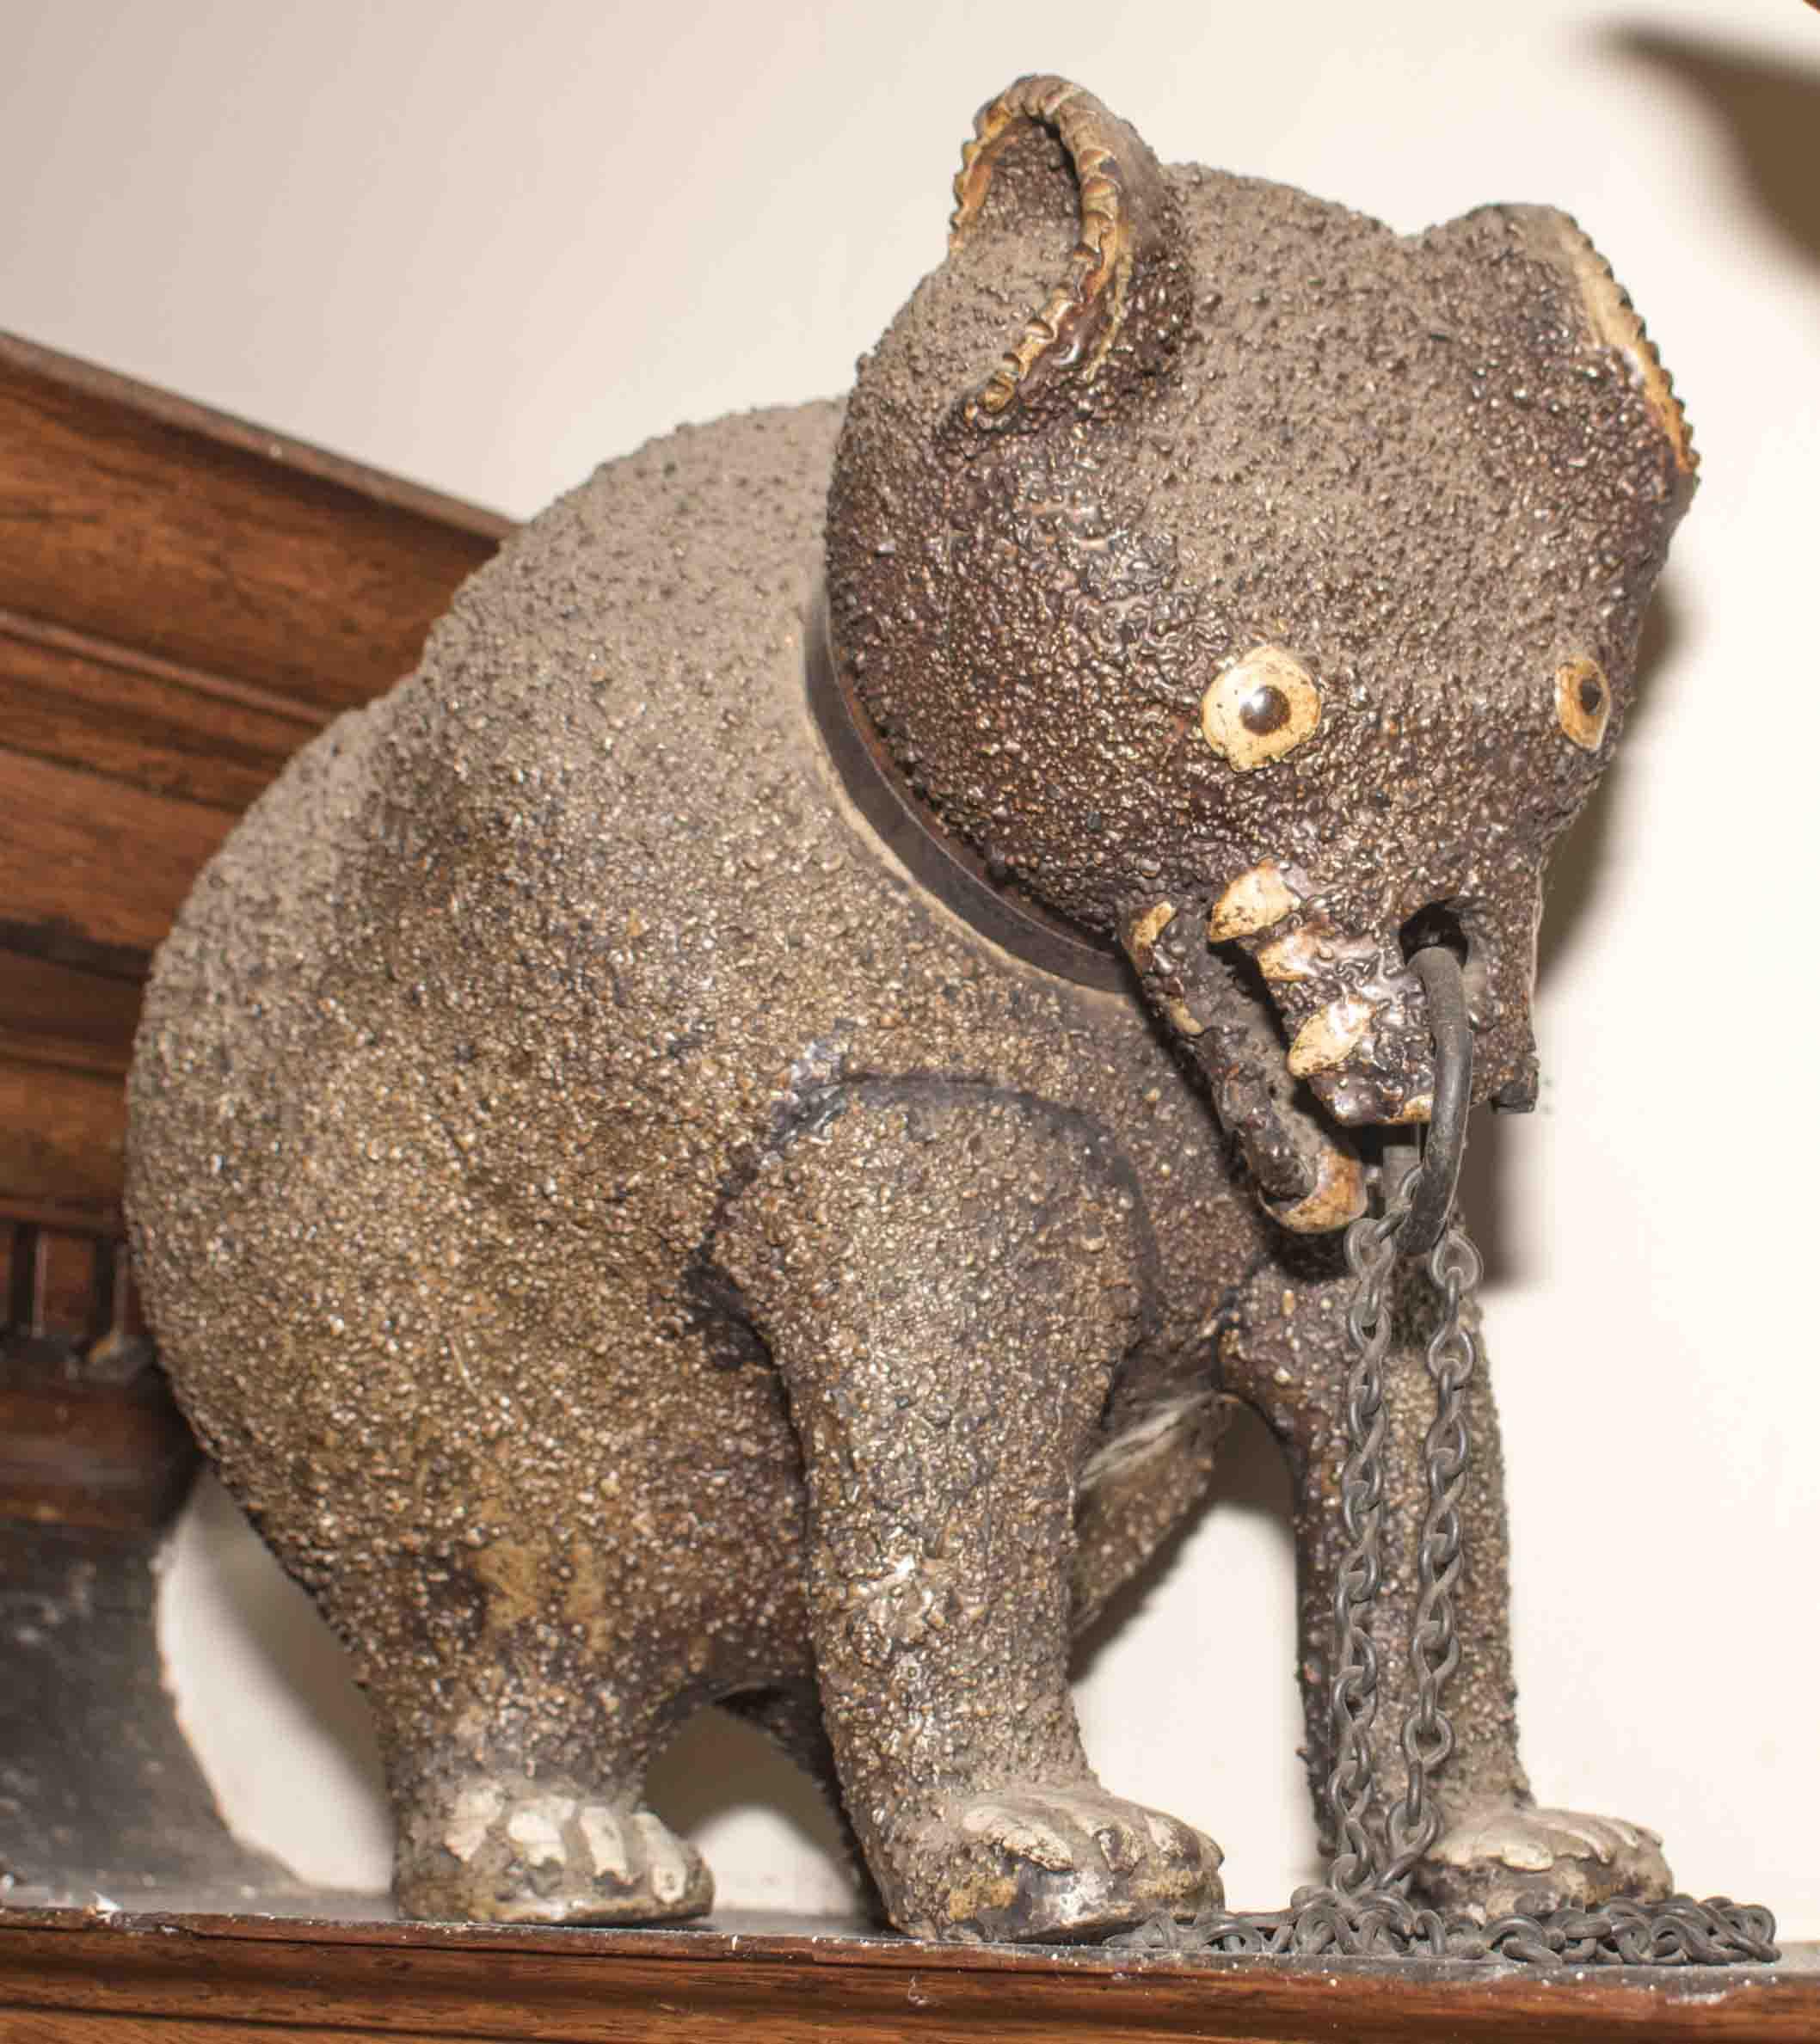 The Bear Mascot